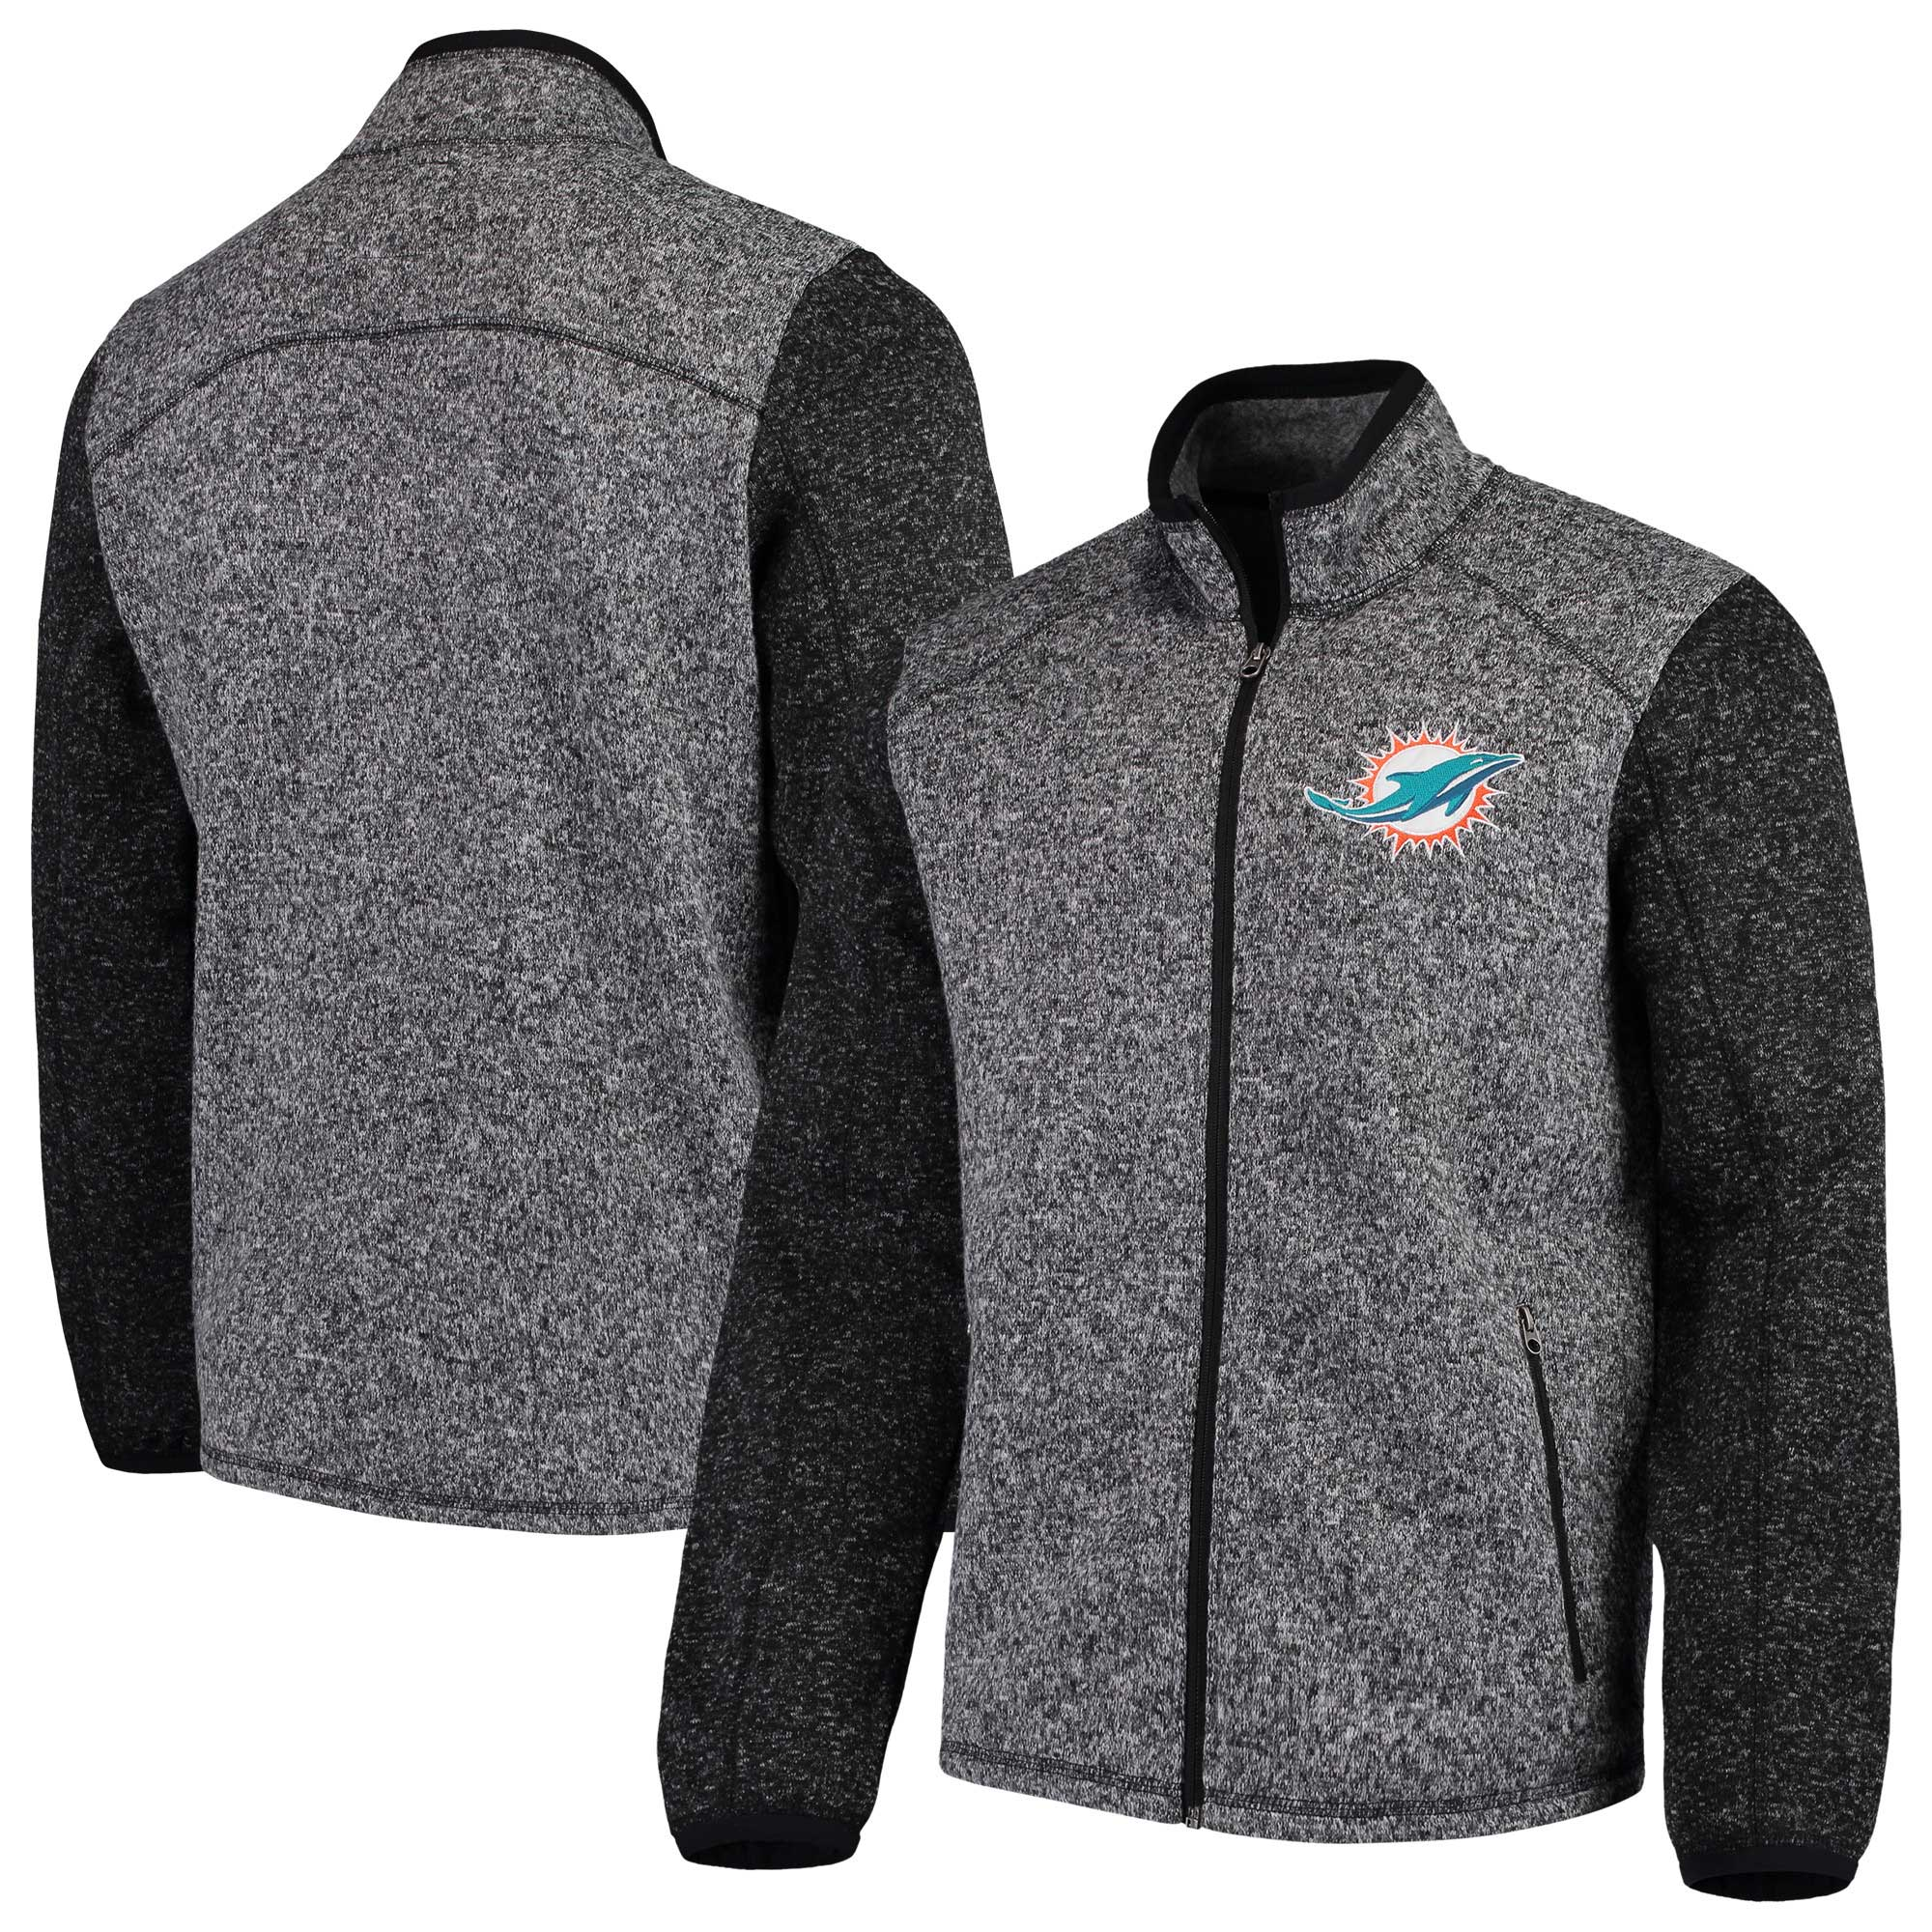 Miami Dolphins G-III Sports by Carl Banks Alpine Zone Sweater Fleece Full-Zip Jacket - Heathered Charcoal